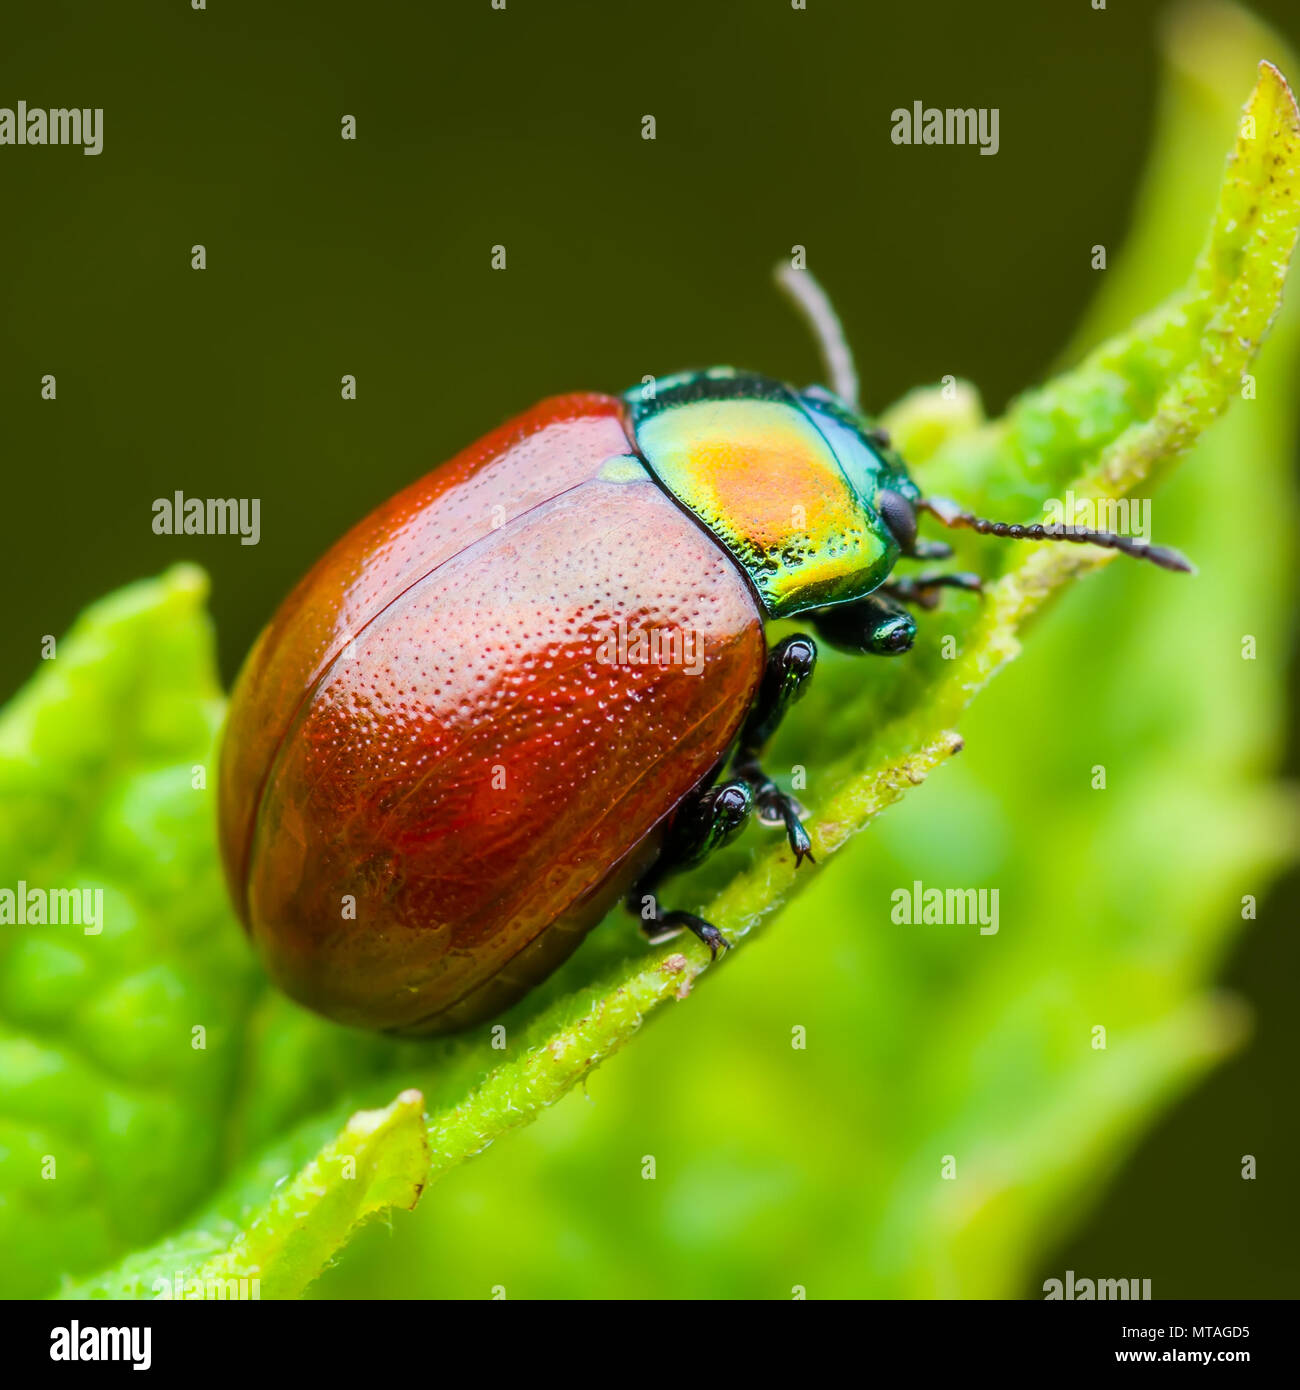 Chrysolina Coerulans Rot Minzeblatt käfer insekt kriecht auf grünem Blatt Makro Stockbild